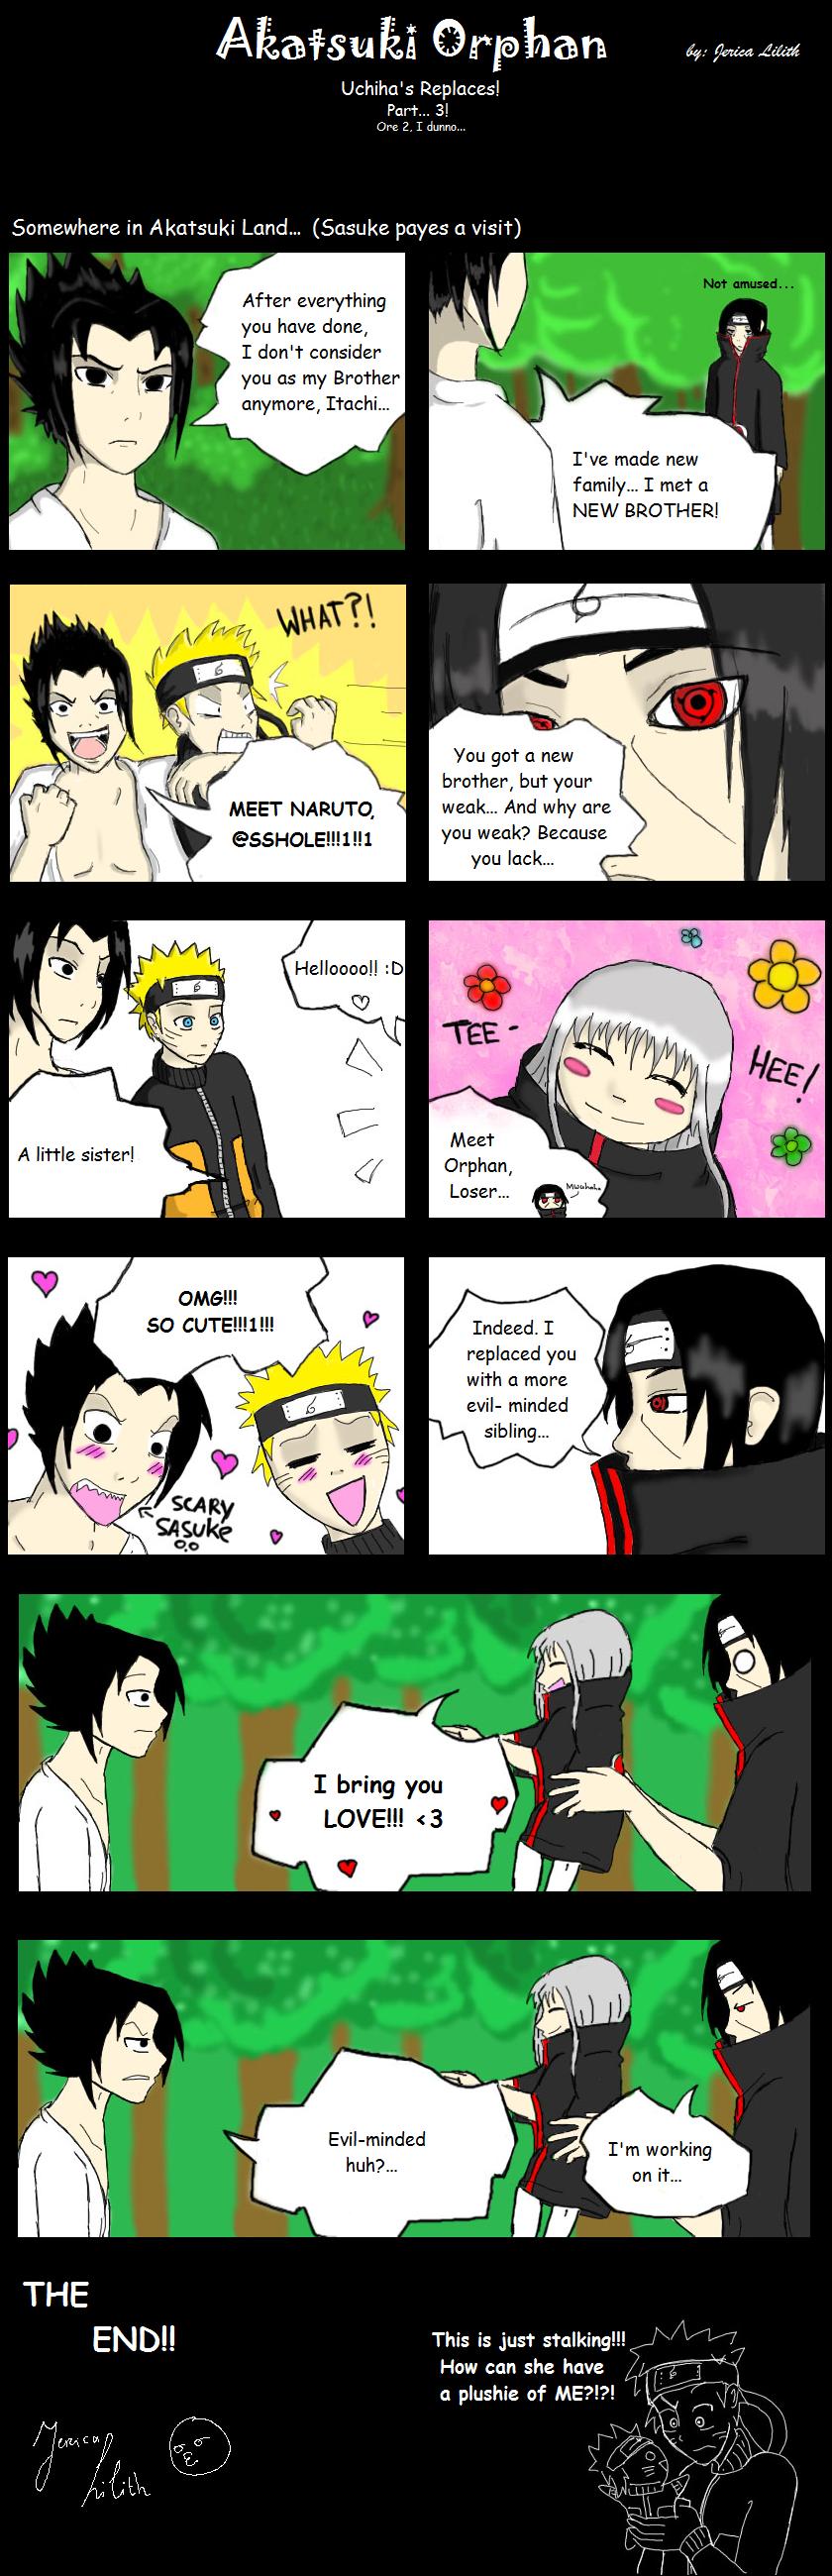 Akatsuki Orphan - Comic 2 by JericaLilith